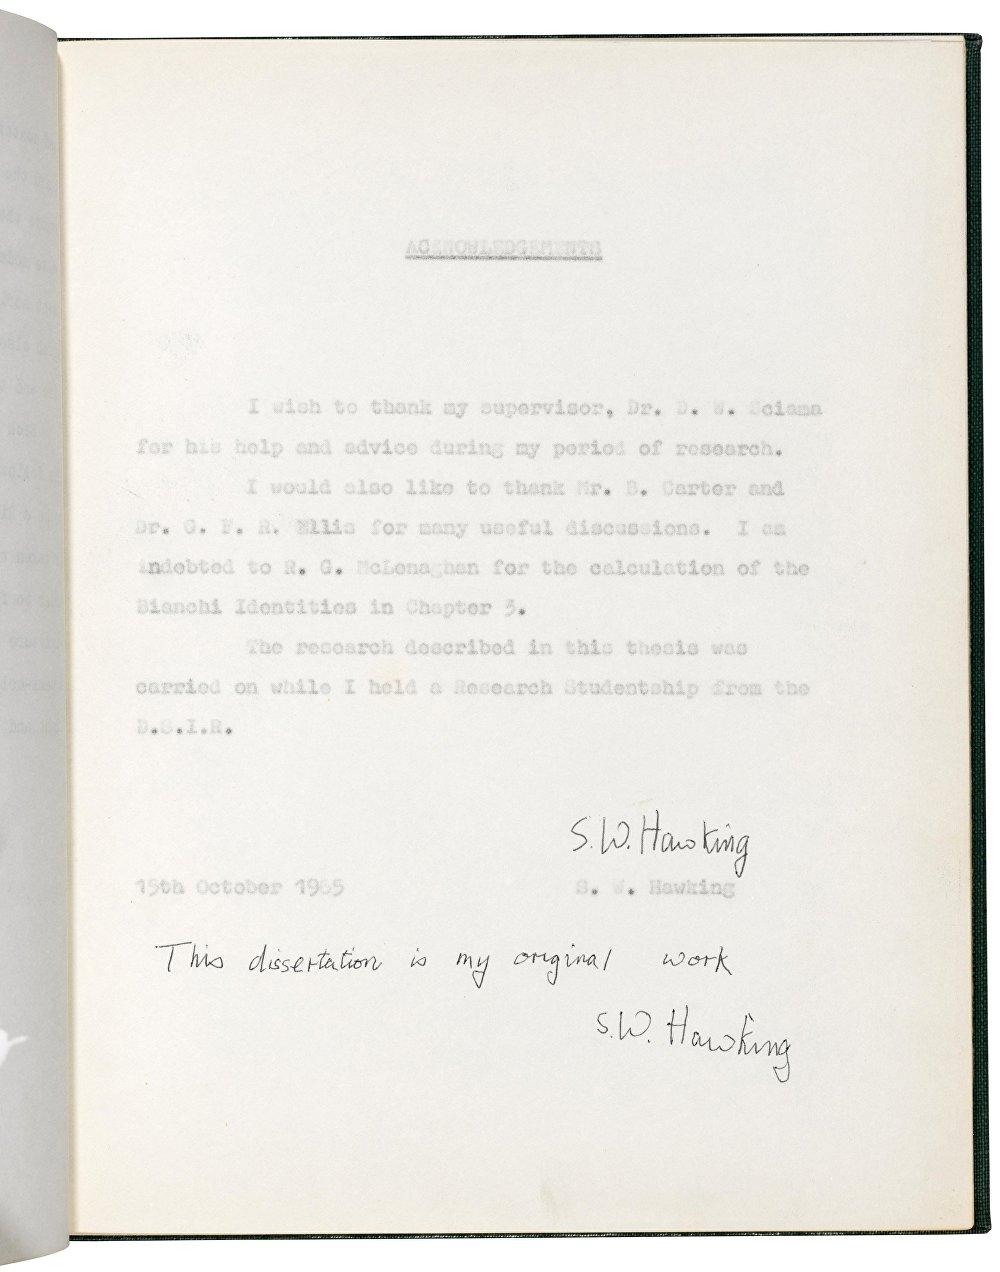 This dissertation is my original work' Stephen Hawking. 15 October 1965 Estimate: GBP 100,000 - GBP 150,000